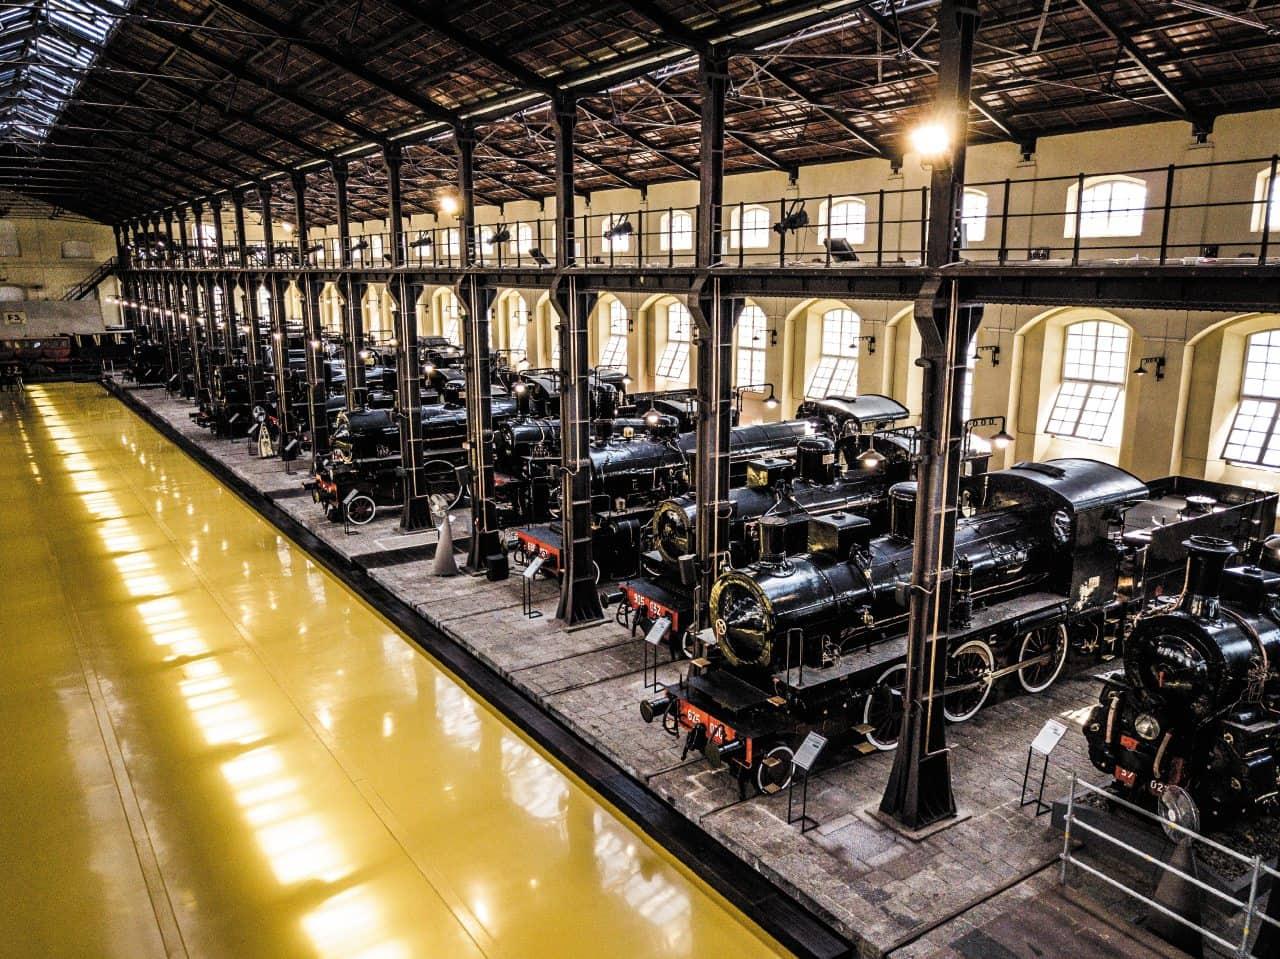 20210305152203museo-pietrarsa-Padiglione-Locomotive-a-Vapore.jpg